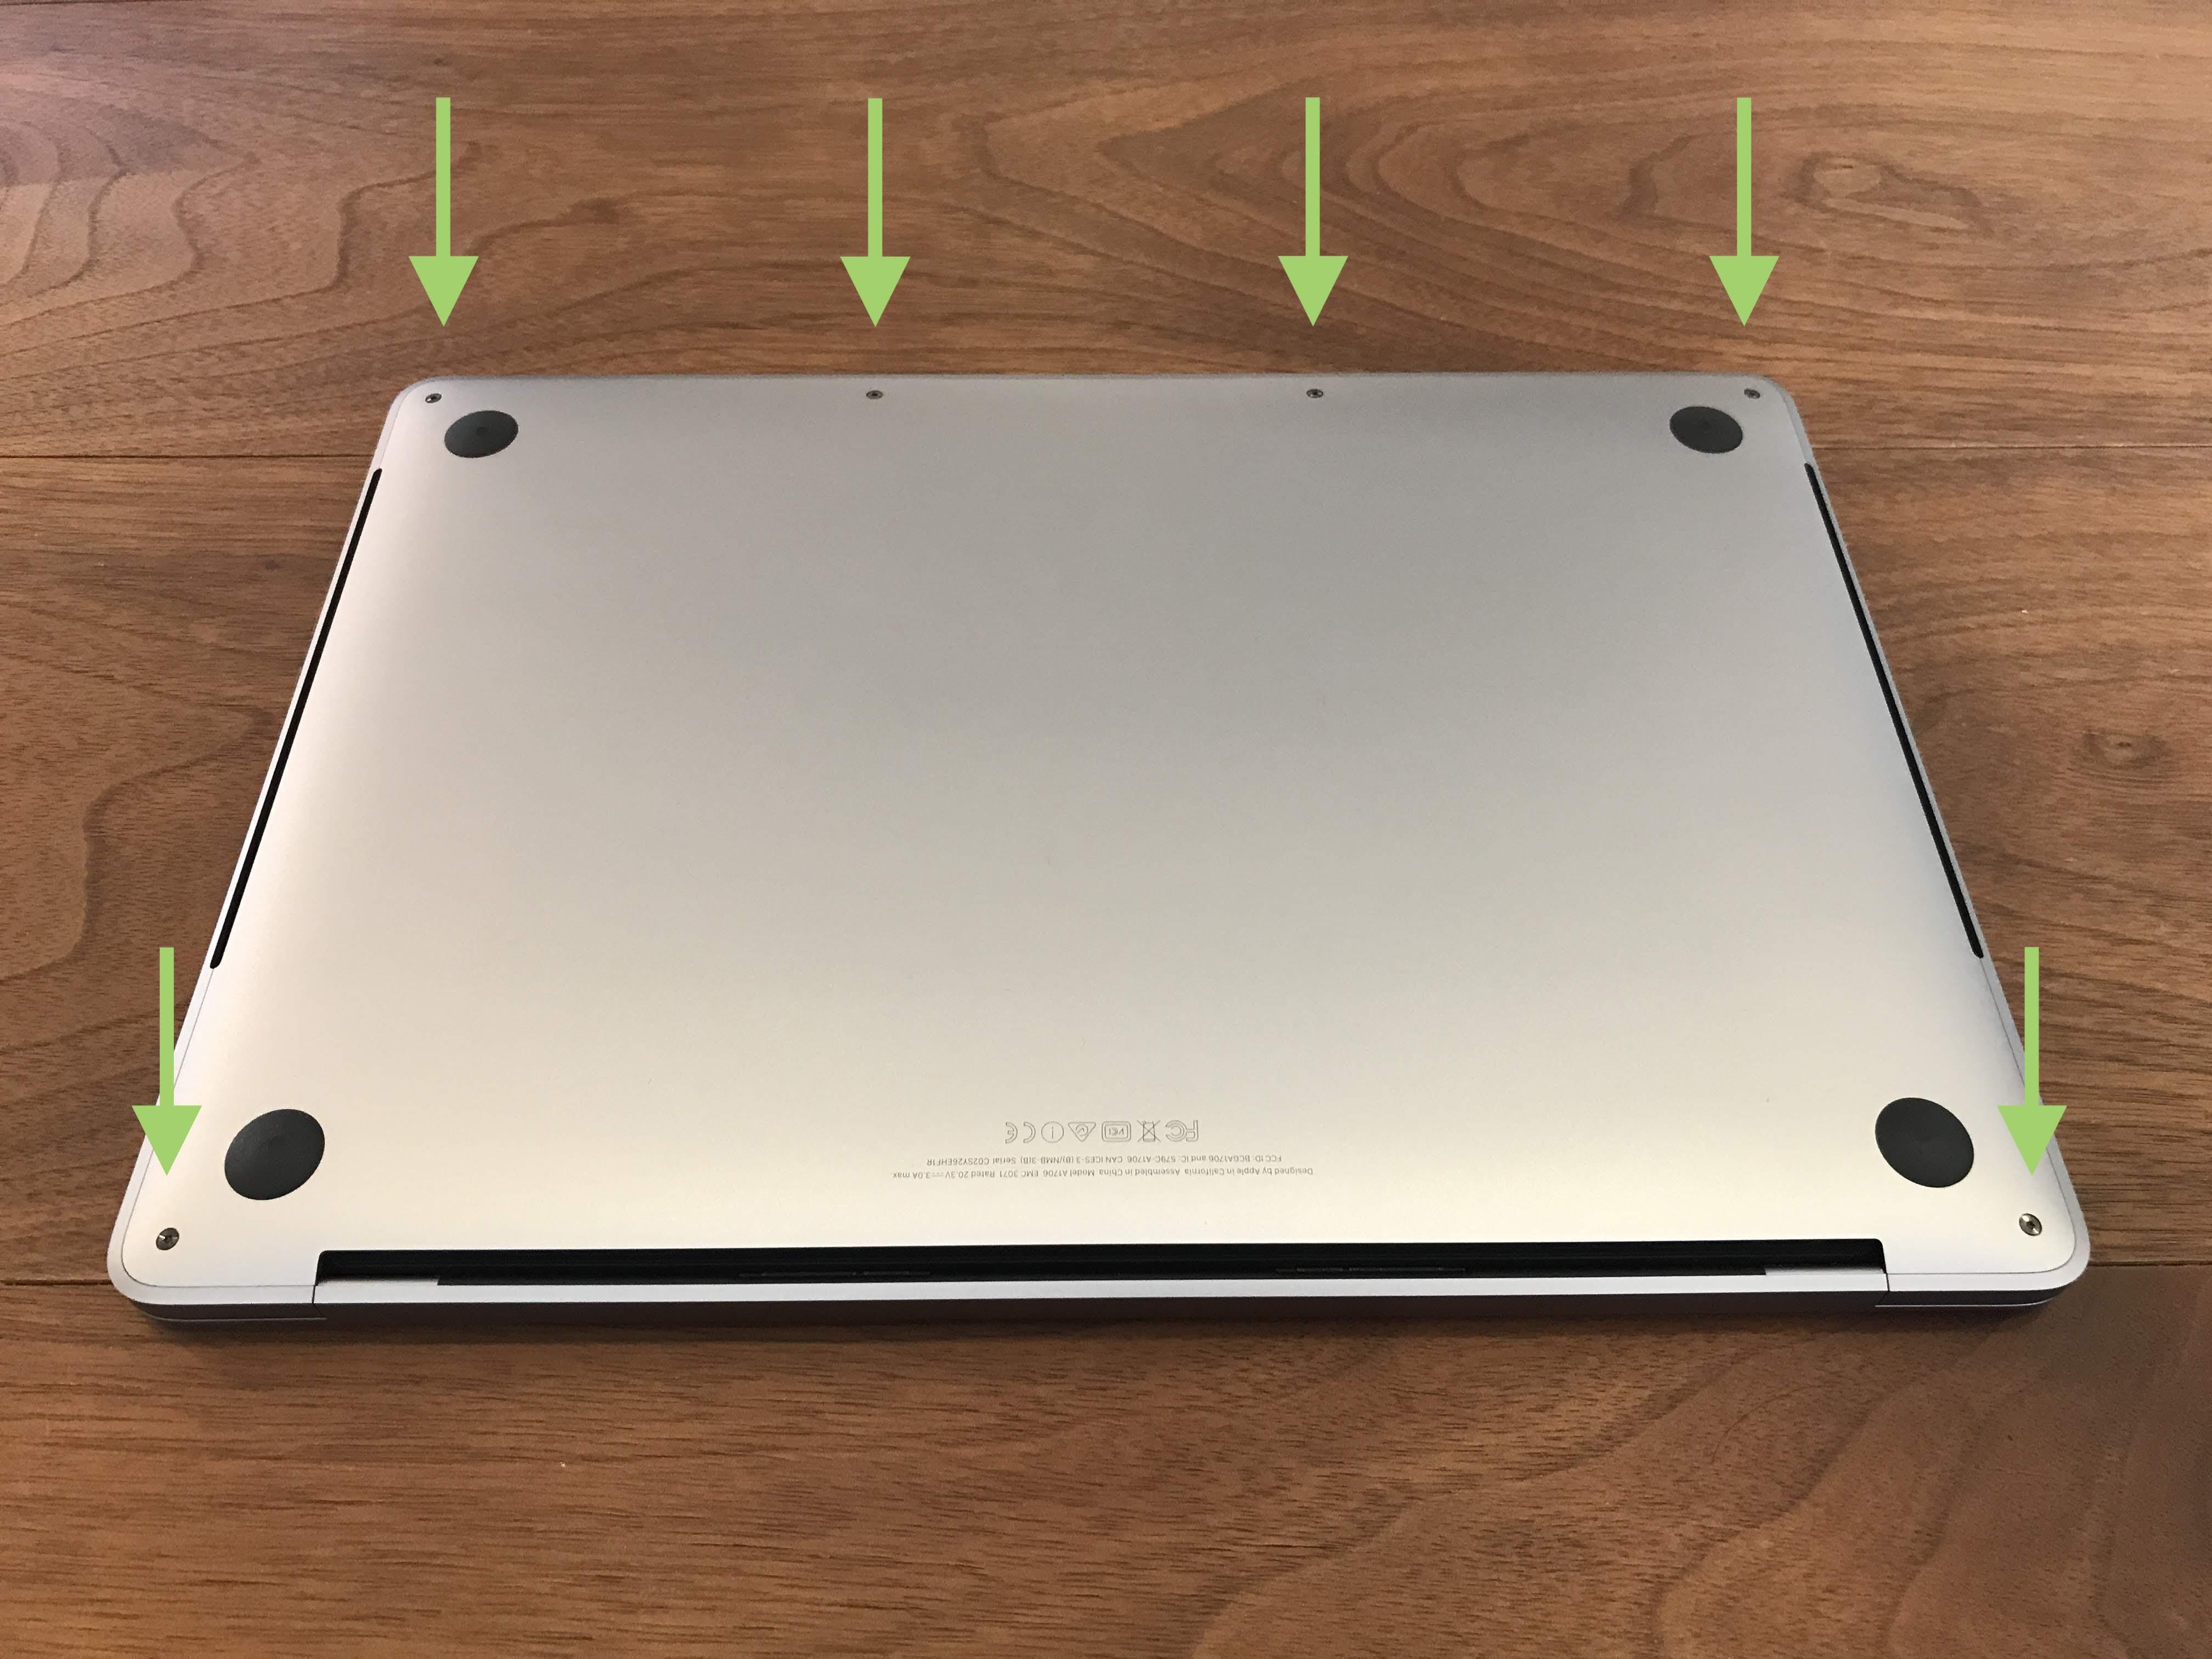 MacBook Proの裏蓋のネジ止め箇所